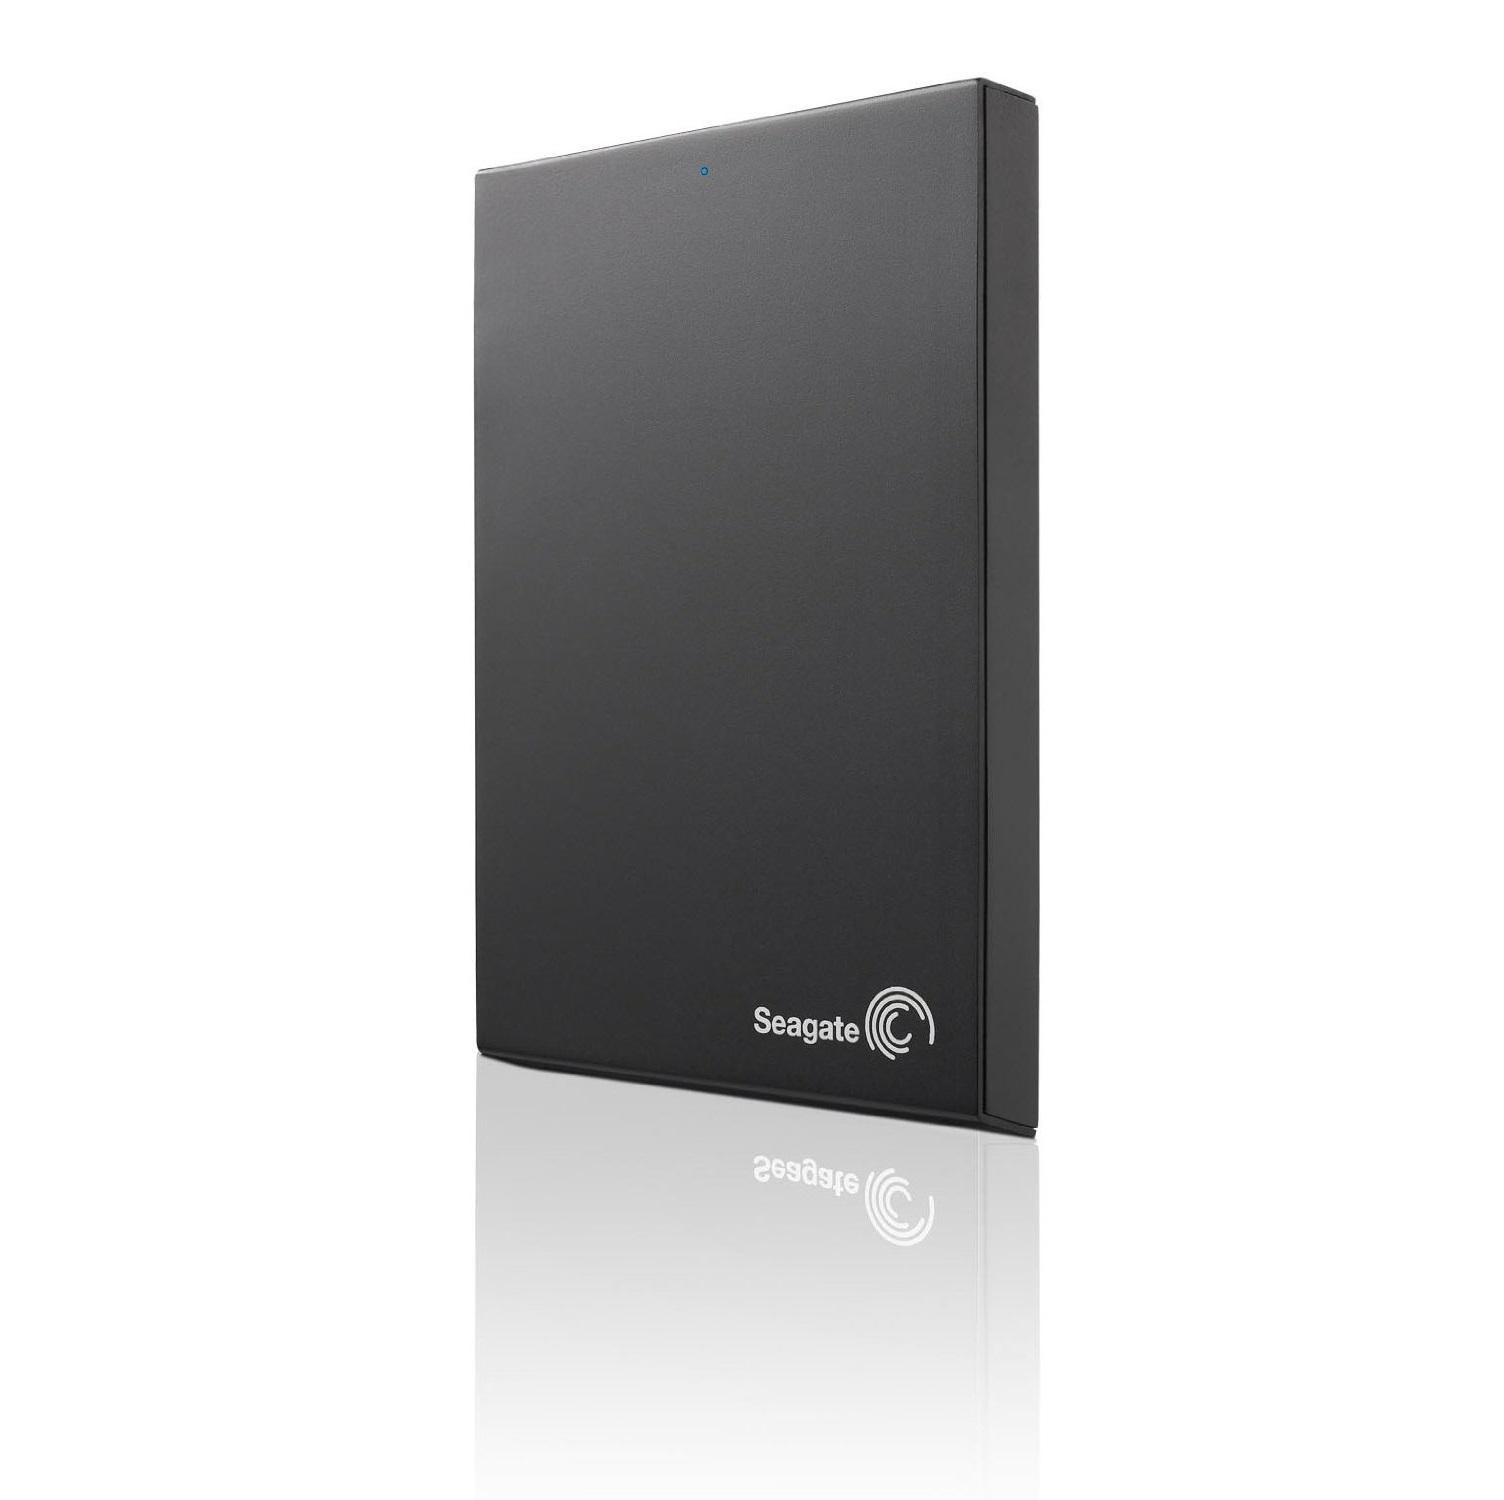 Ổ cứng di động Seagate 2TB Portable Expansion 3.0